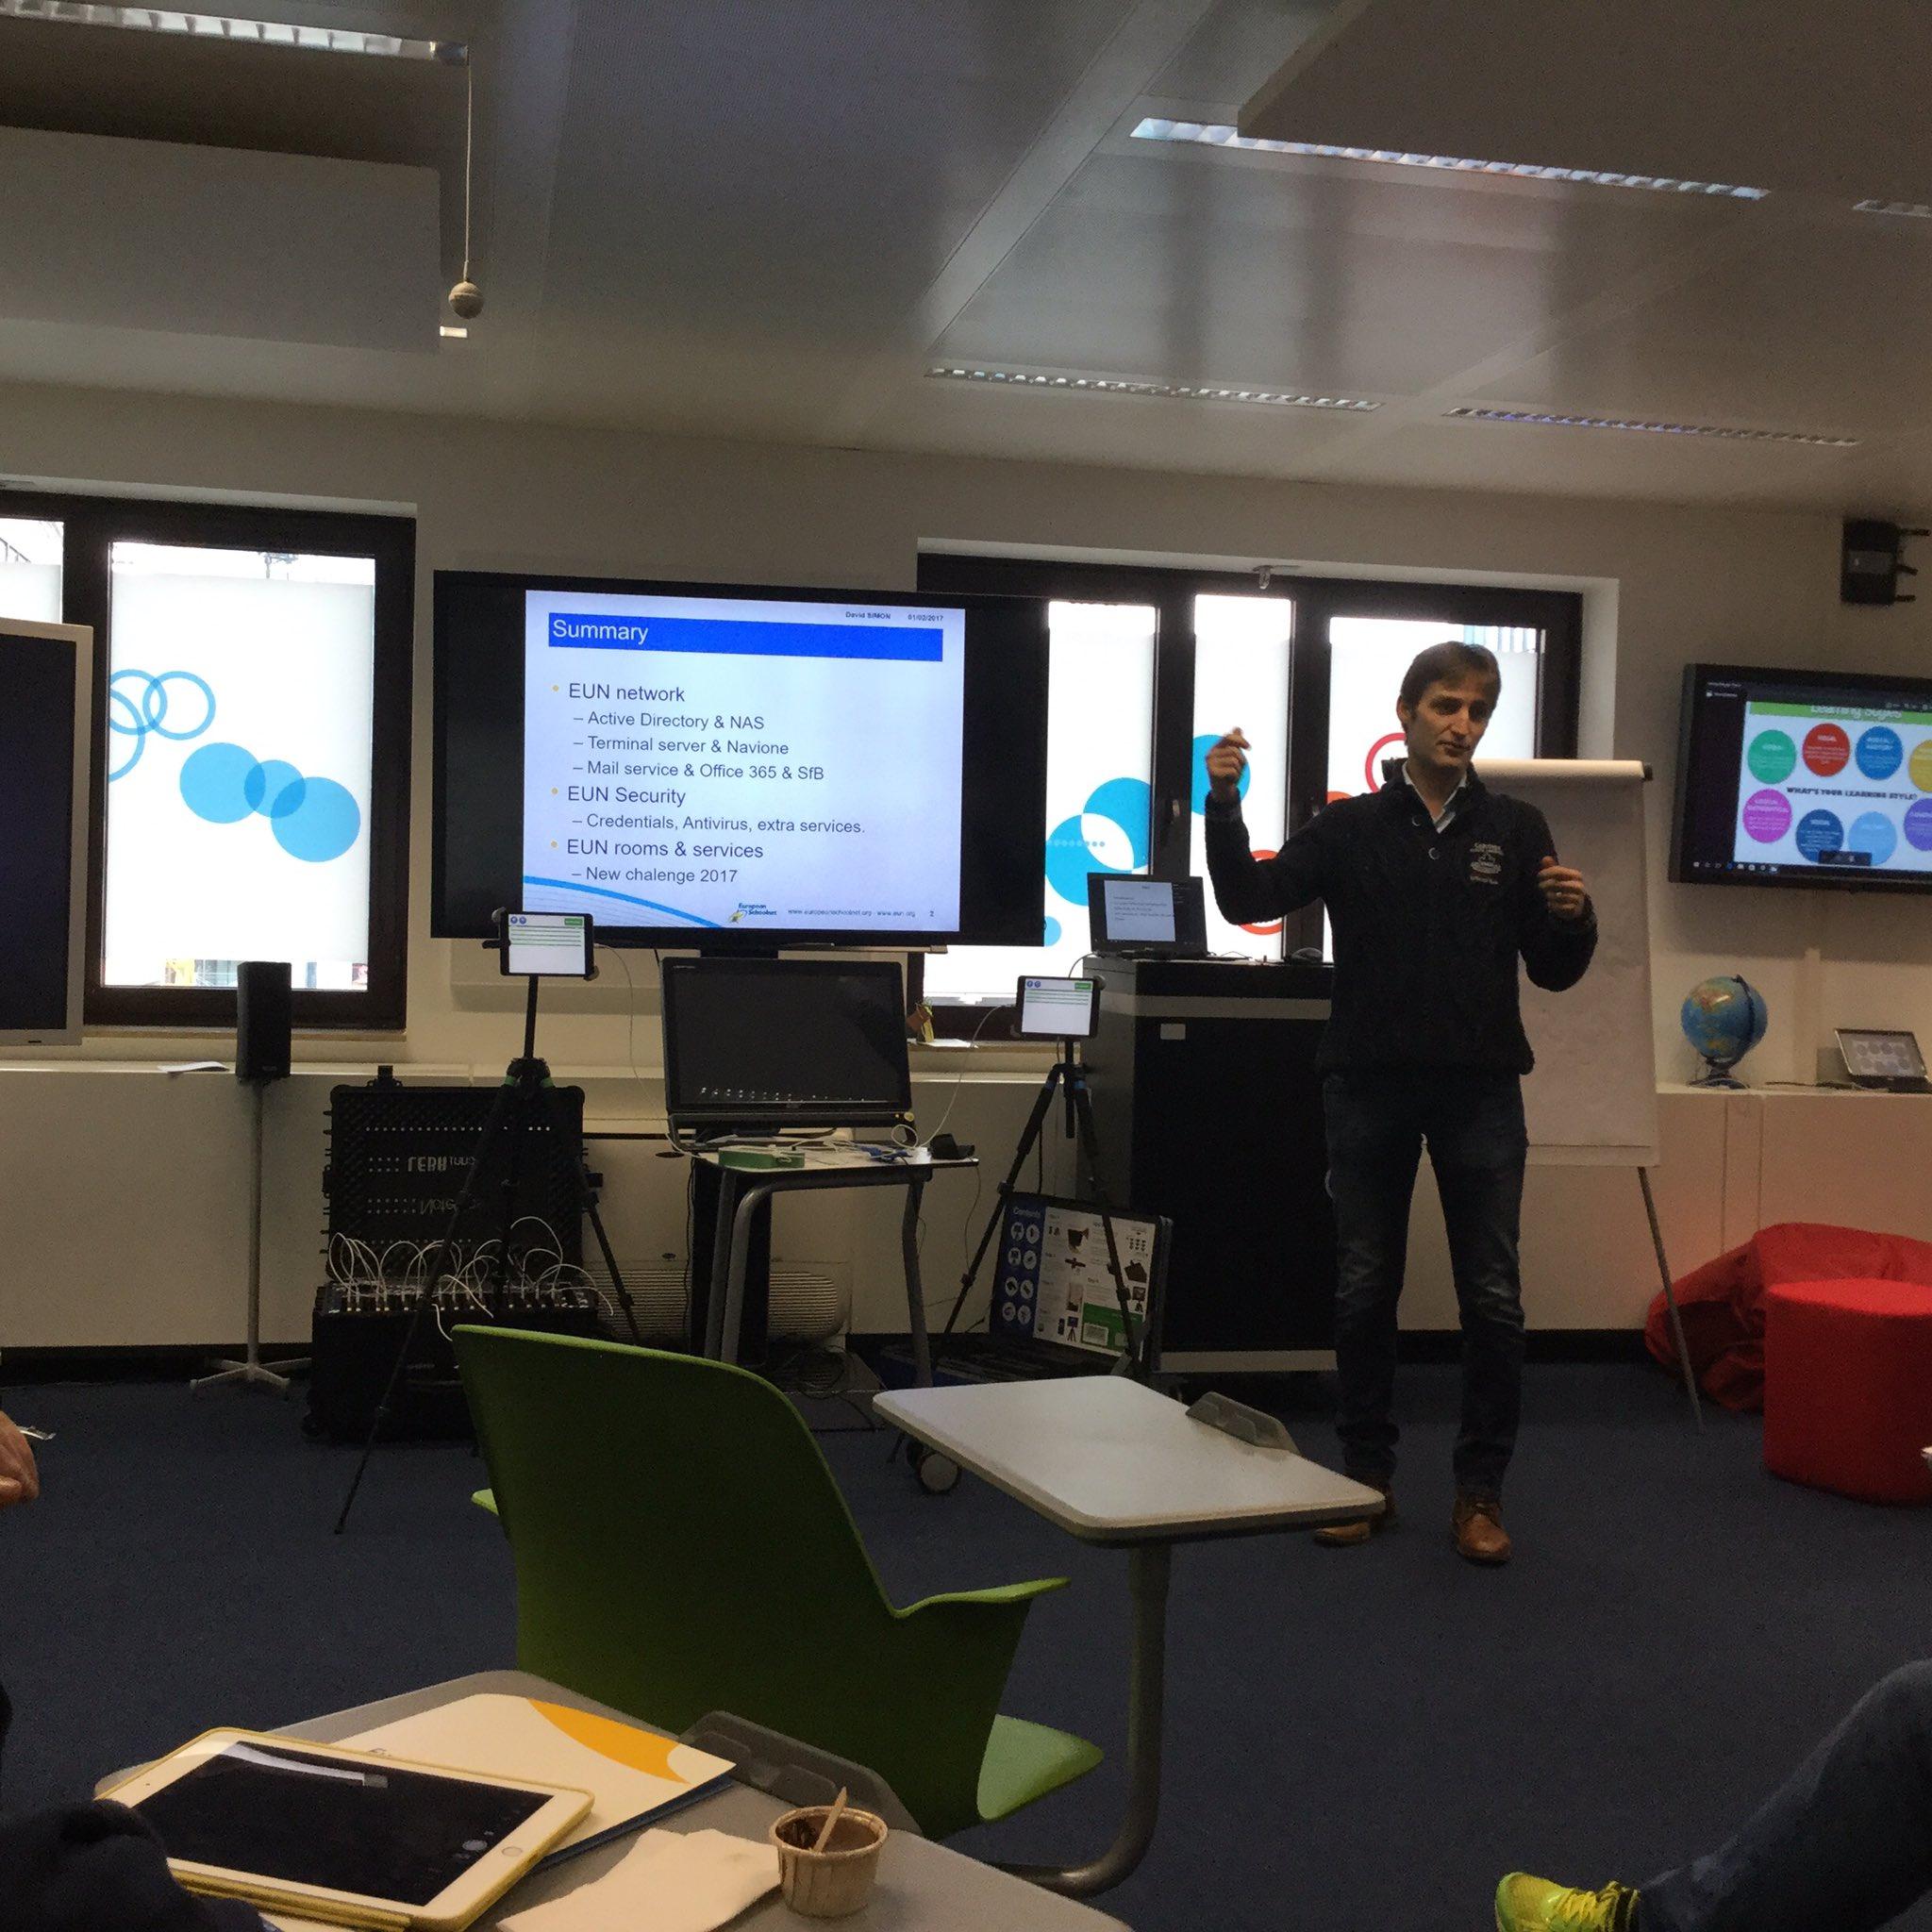 A lot of questions about the @eu_schoolnet network works #AllSTEMScientix https://t.co/q0omQHPk2l